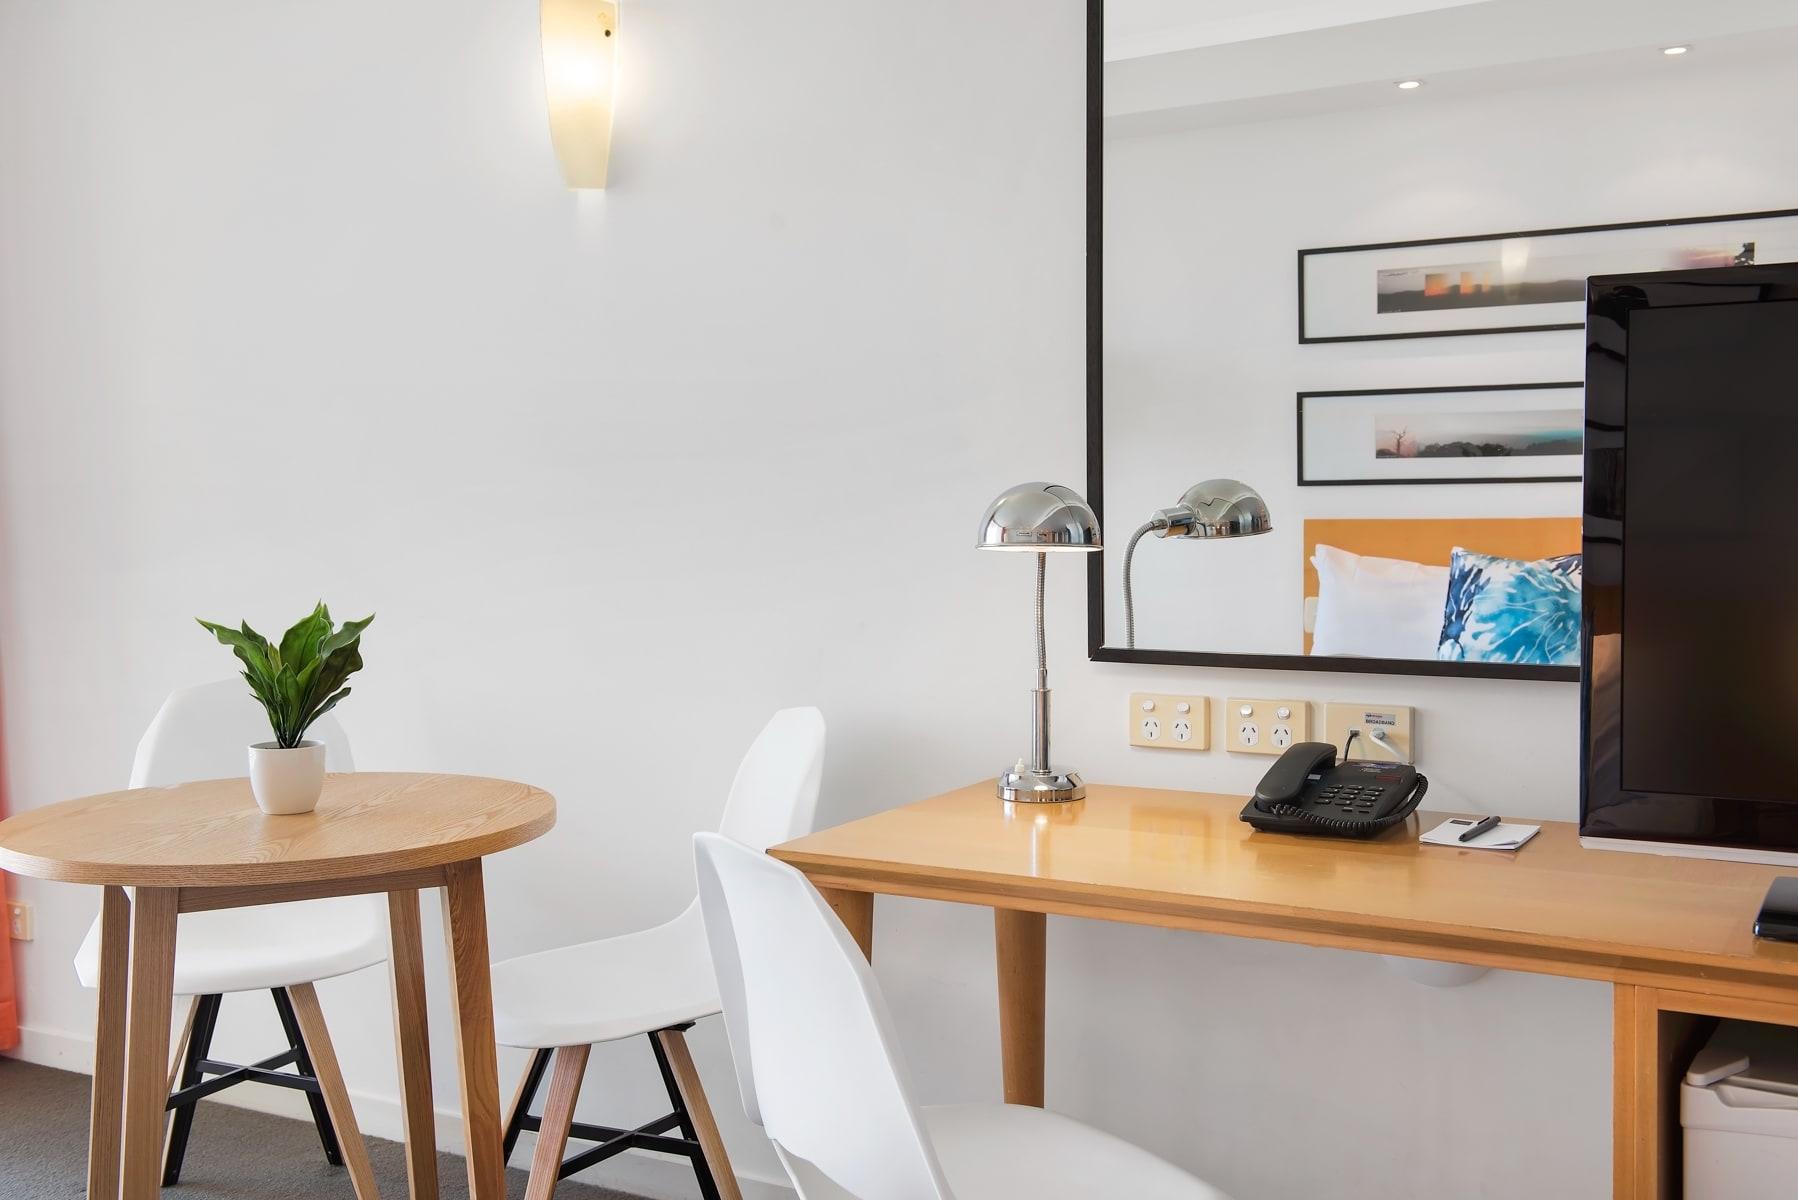 Studio Desk Dining